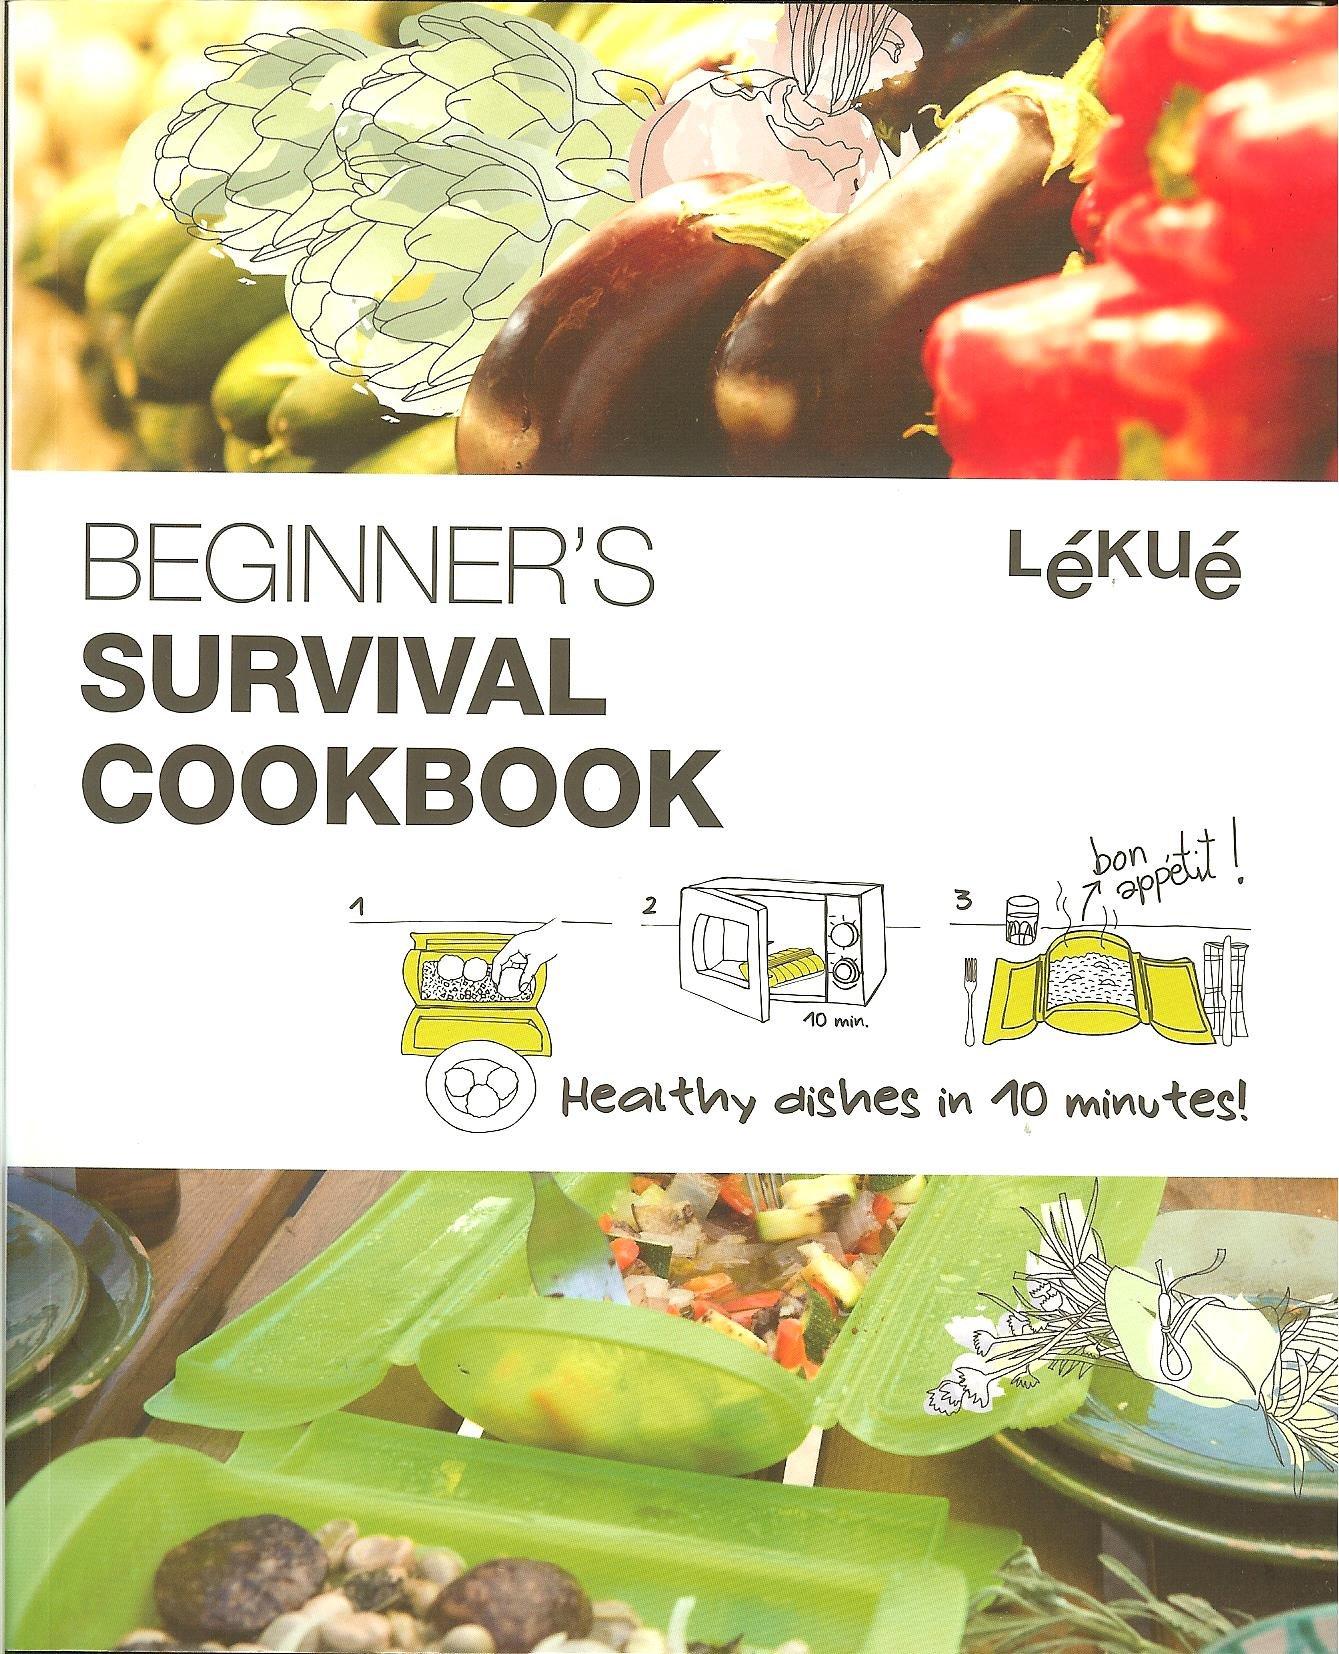 Amazon.com: Lekue – para principiantes, diseño de guía de ...